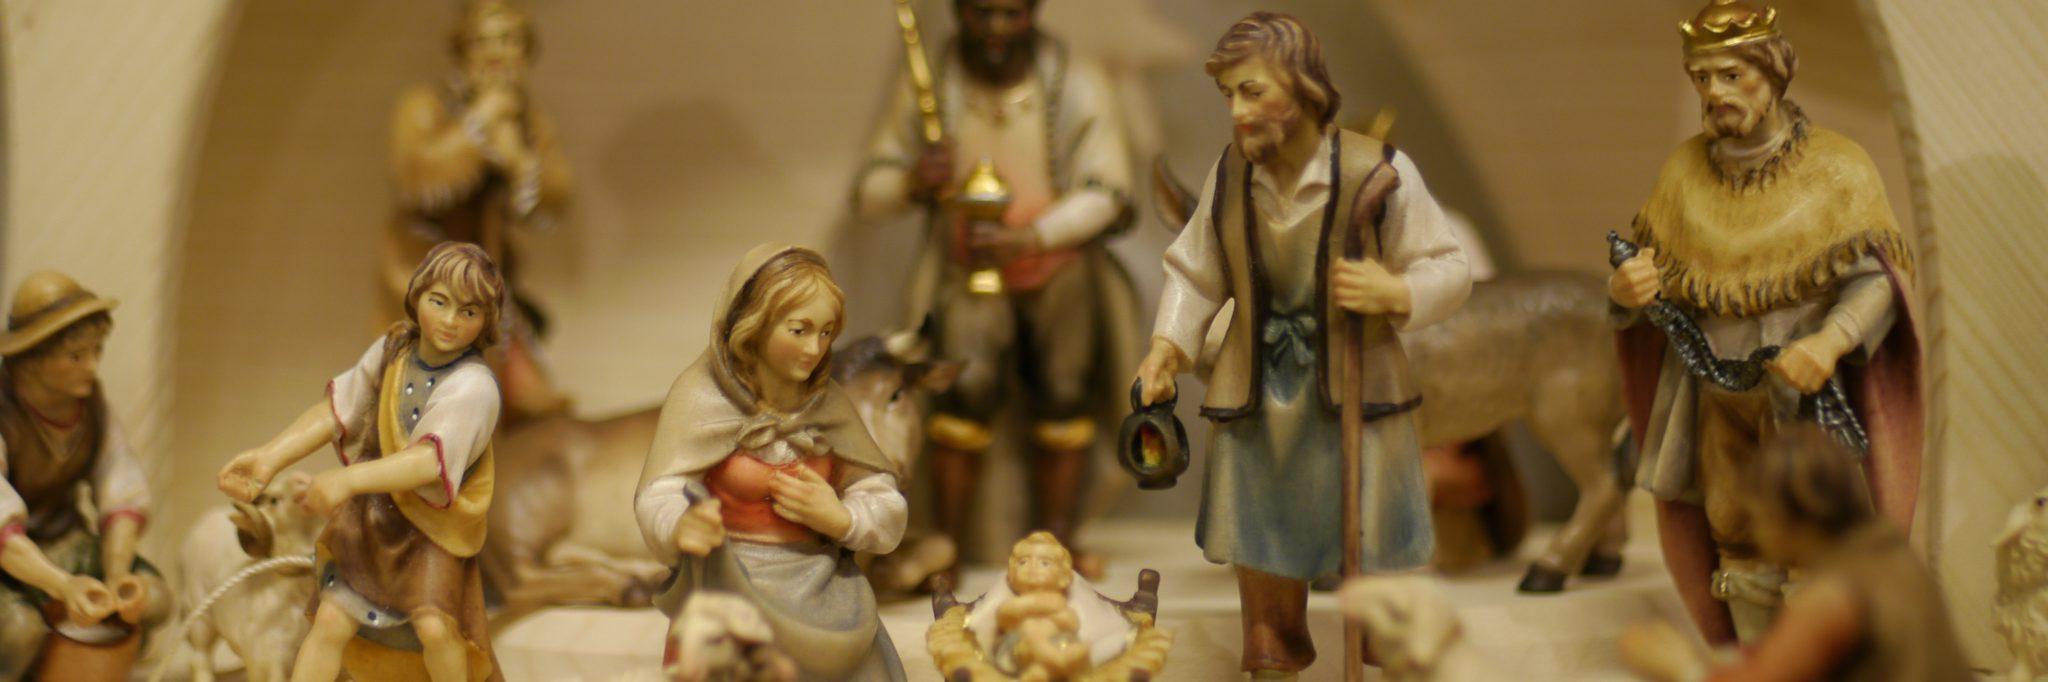 Shepherds crib